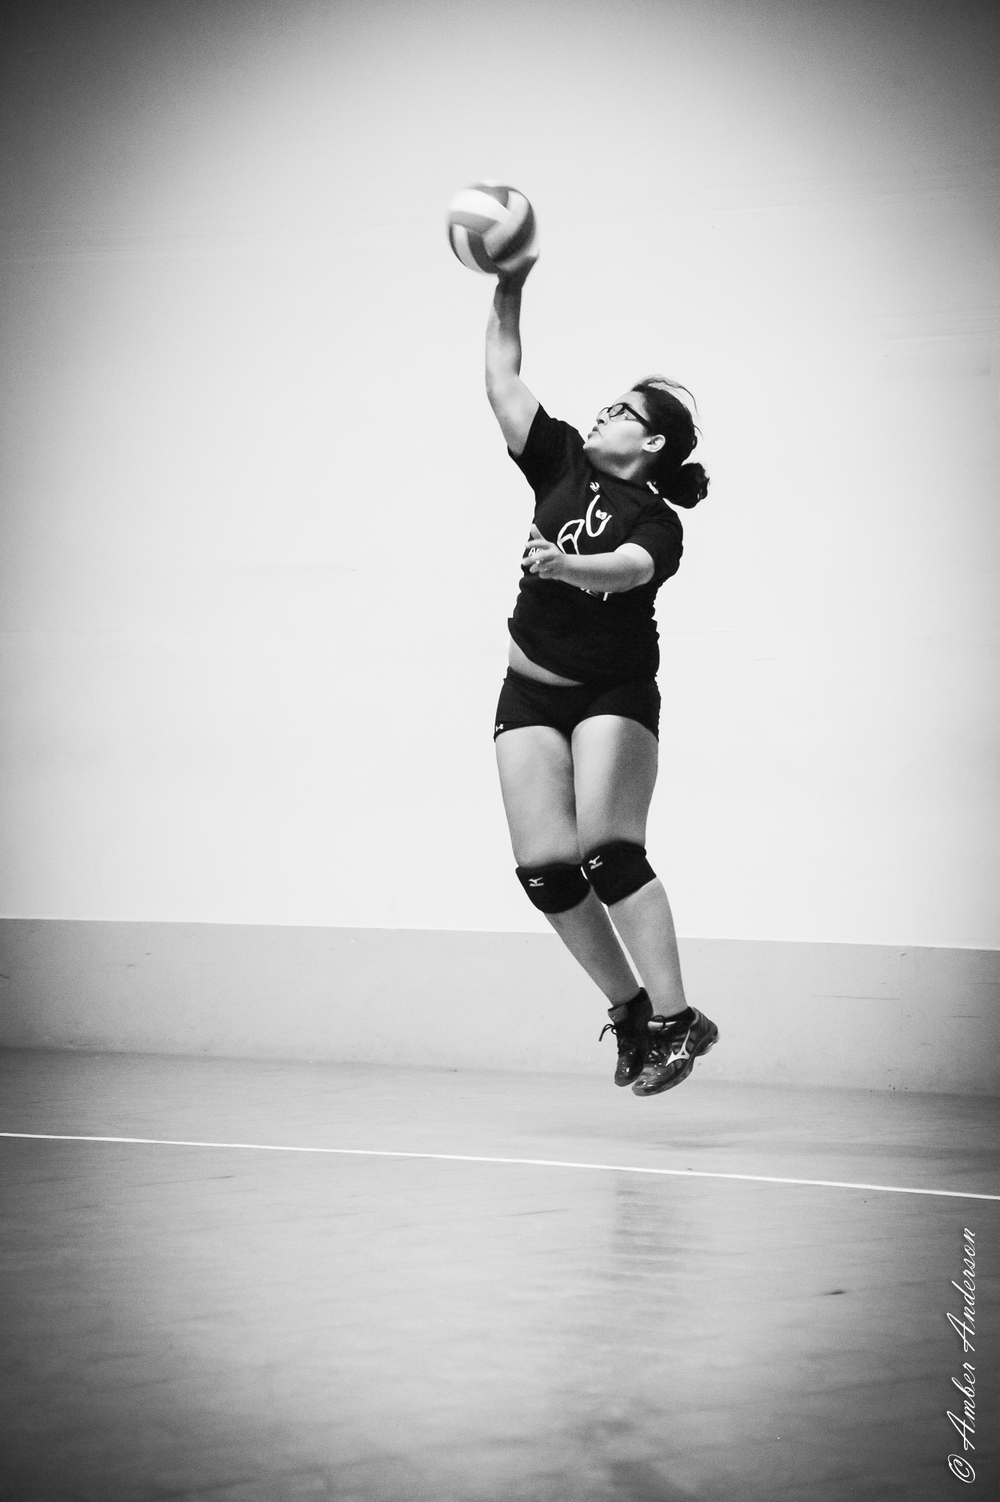 Jump Server Daja Jackson style. She's got skillz! Taken at Aspire Volleyball Club in Phoenix, AZ.